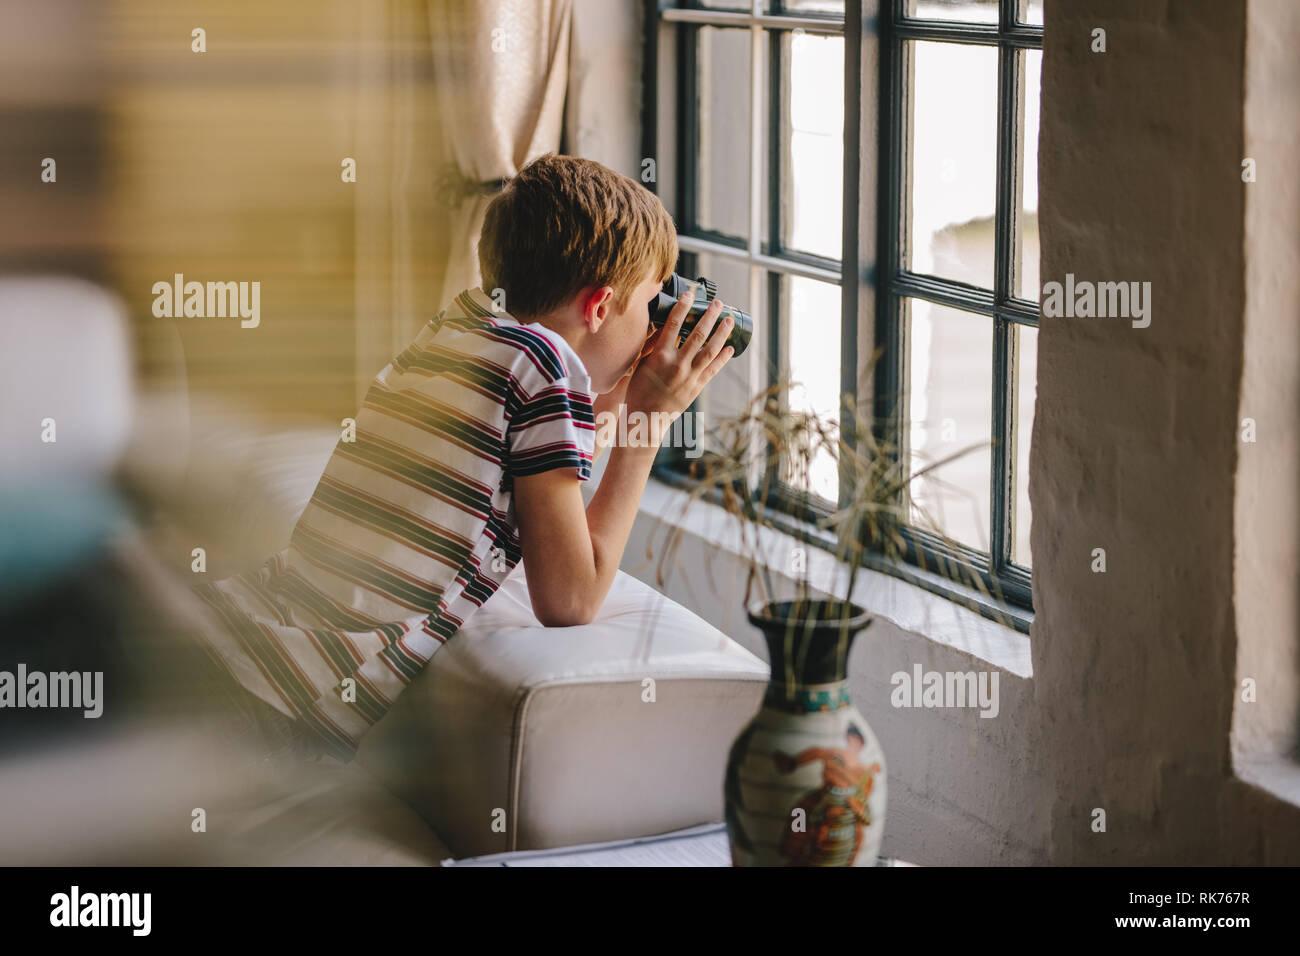 Boy on sofa looking outside window using binoculars. Curious boy looking out the window with binocular. - Stock Image